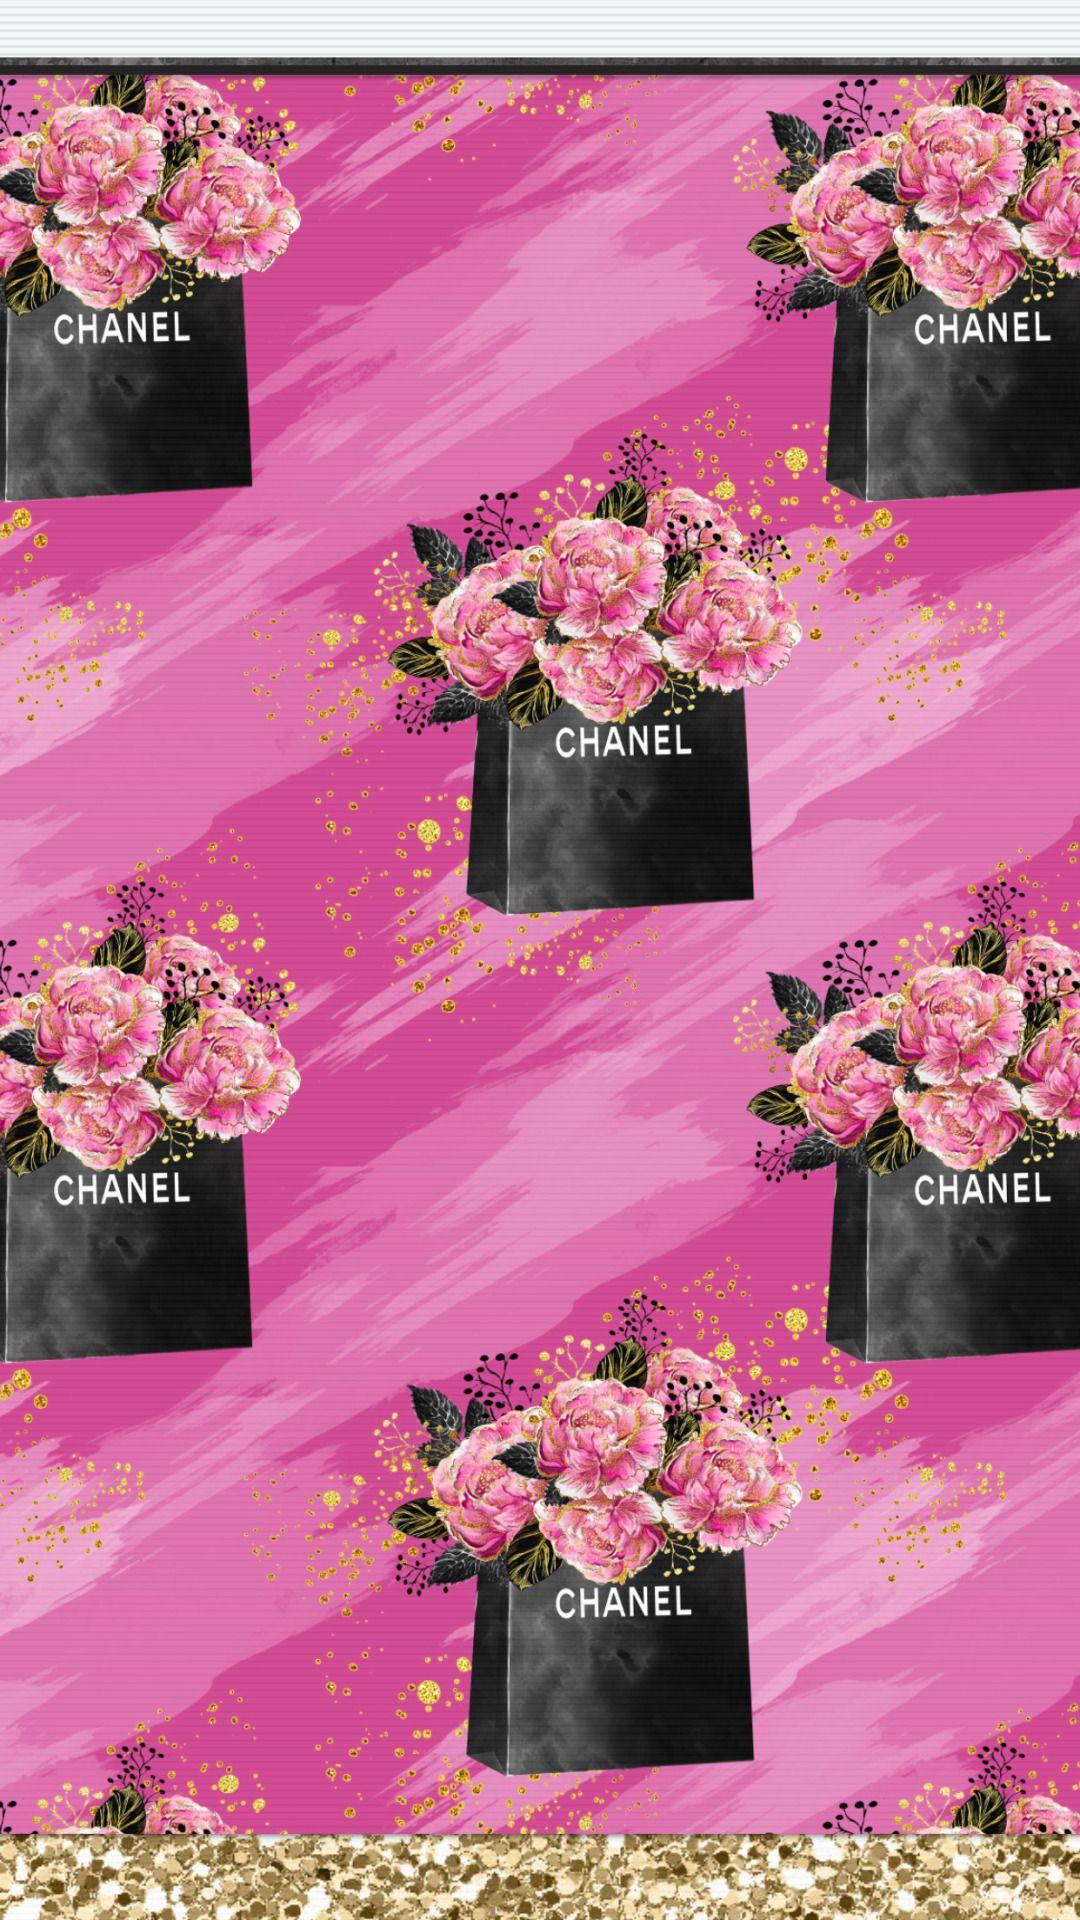 WALLPAPERS — montzee1695 wallpaper chanel Fashion